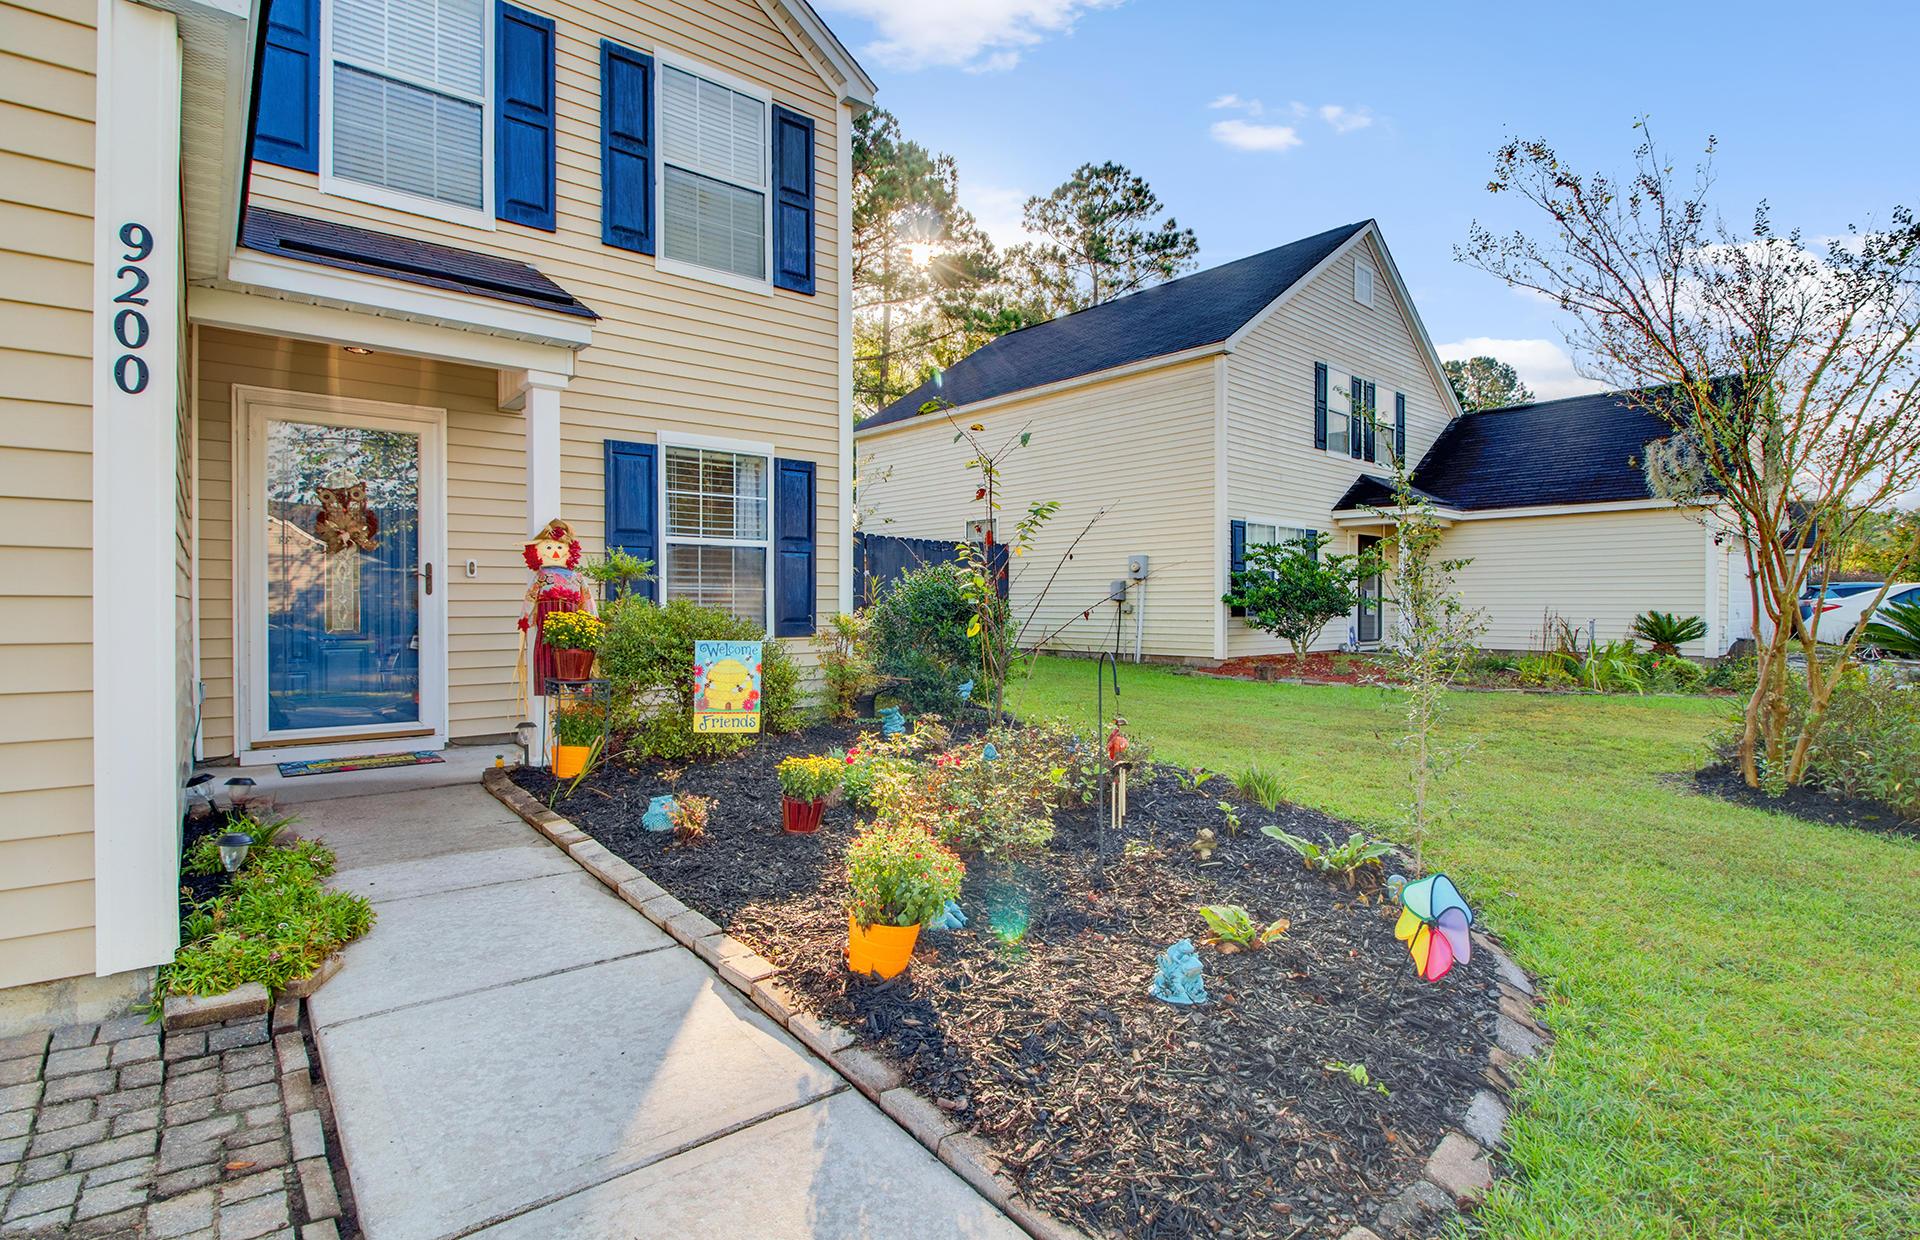 Wescott Plantation Homes For Sale - 9200 Fieldstone, Summerville, SC - 0